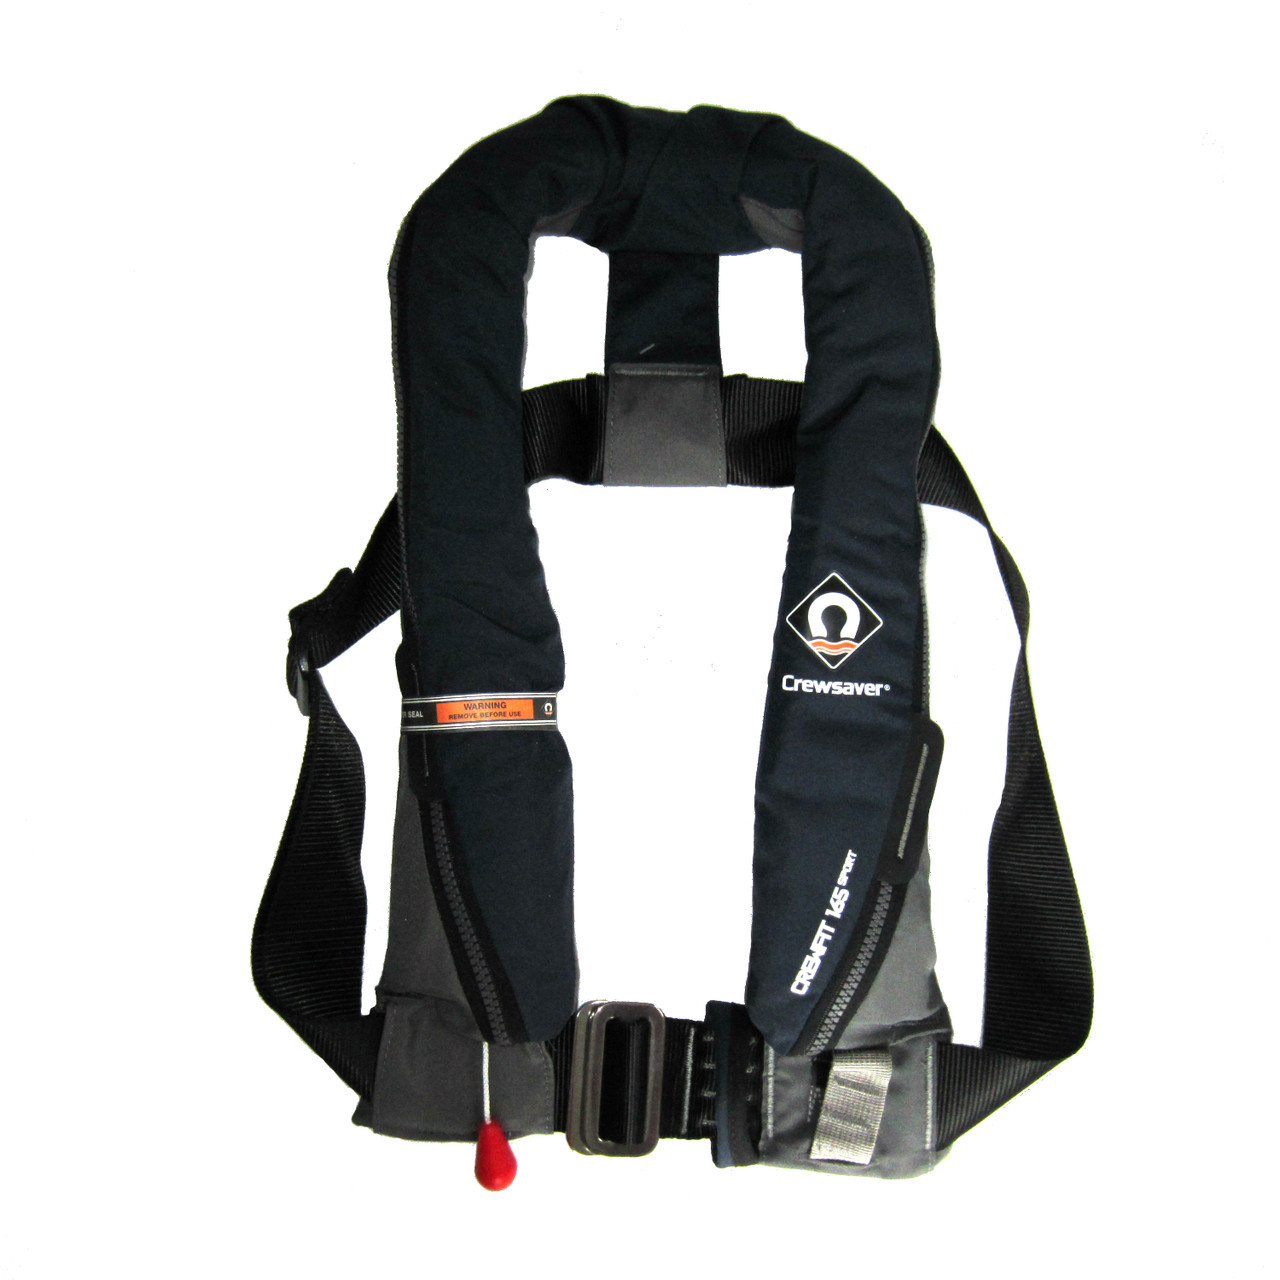 life jacket harness